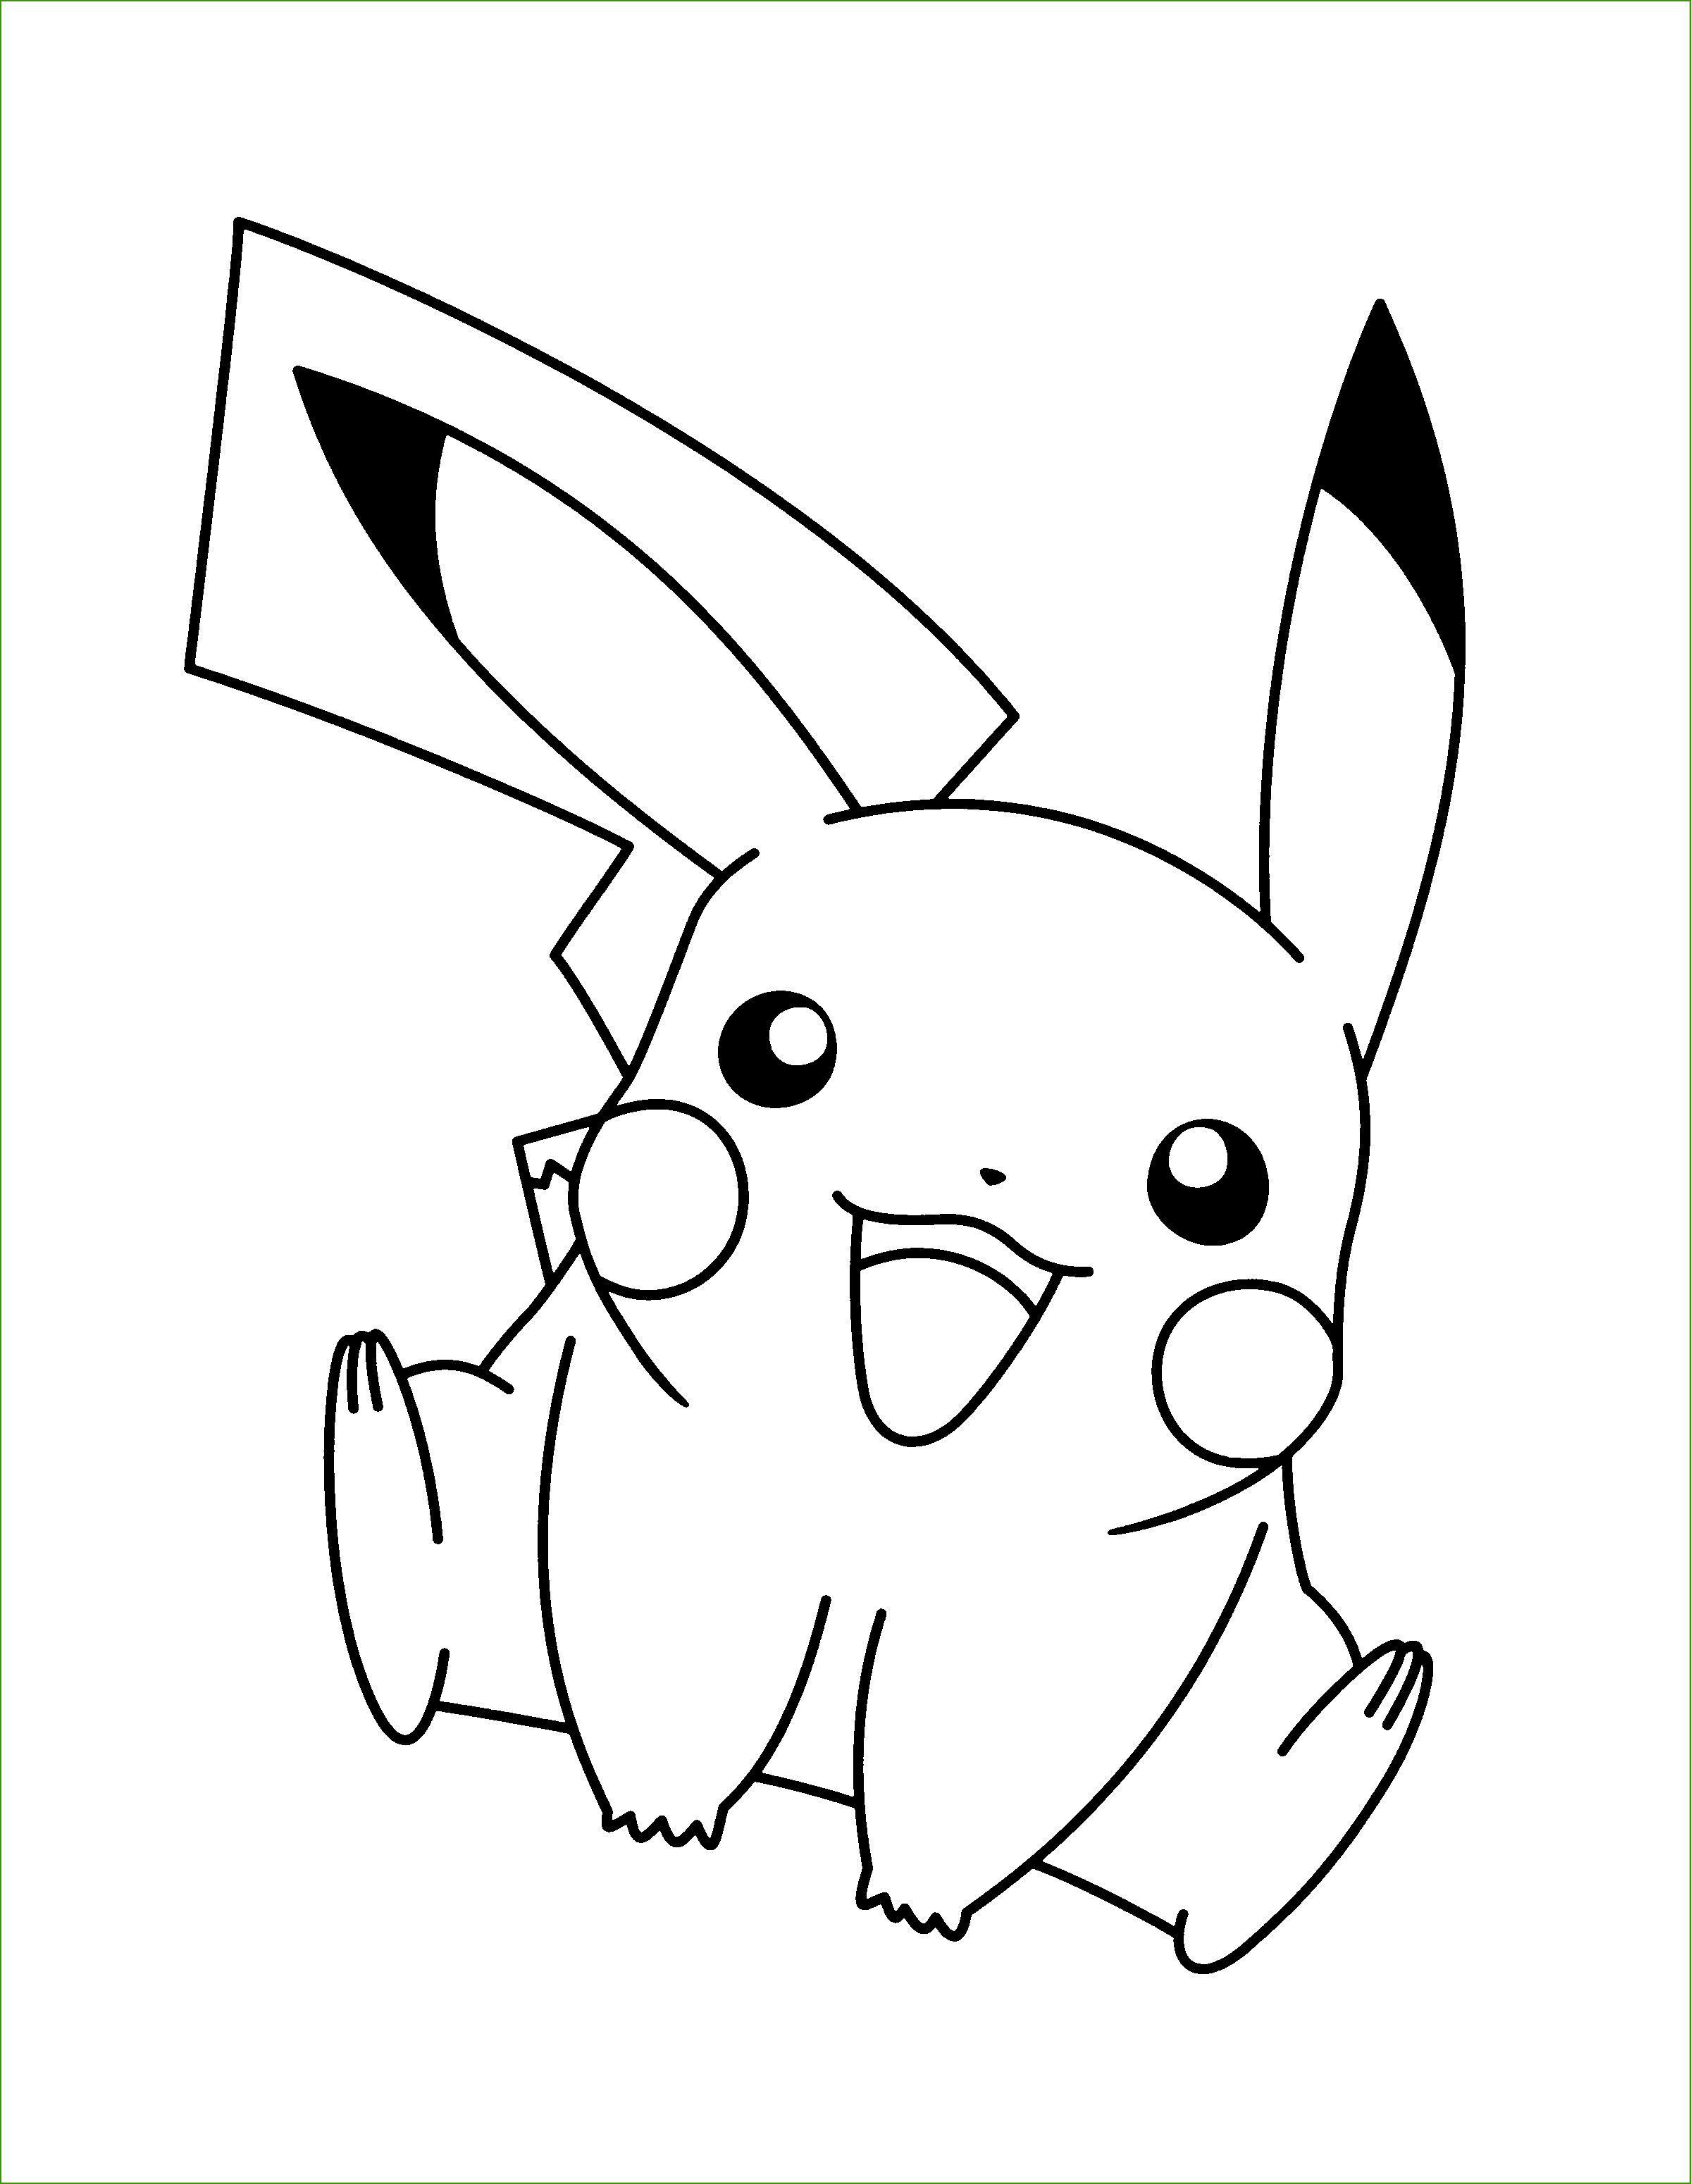 Coloriage Pokemon Mega Raichu Belle Dessins Gratuits encequiconcerne Coloriage Pokemon Raichu